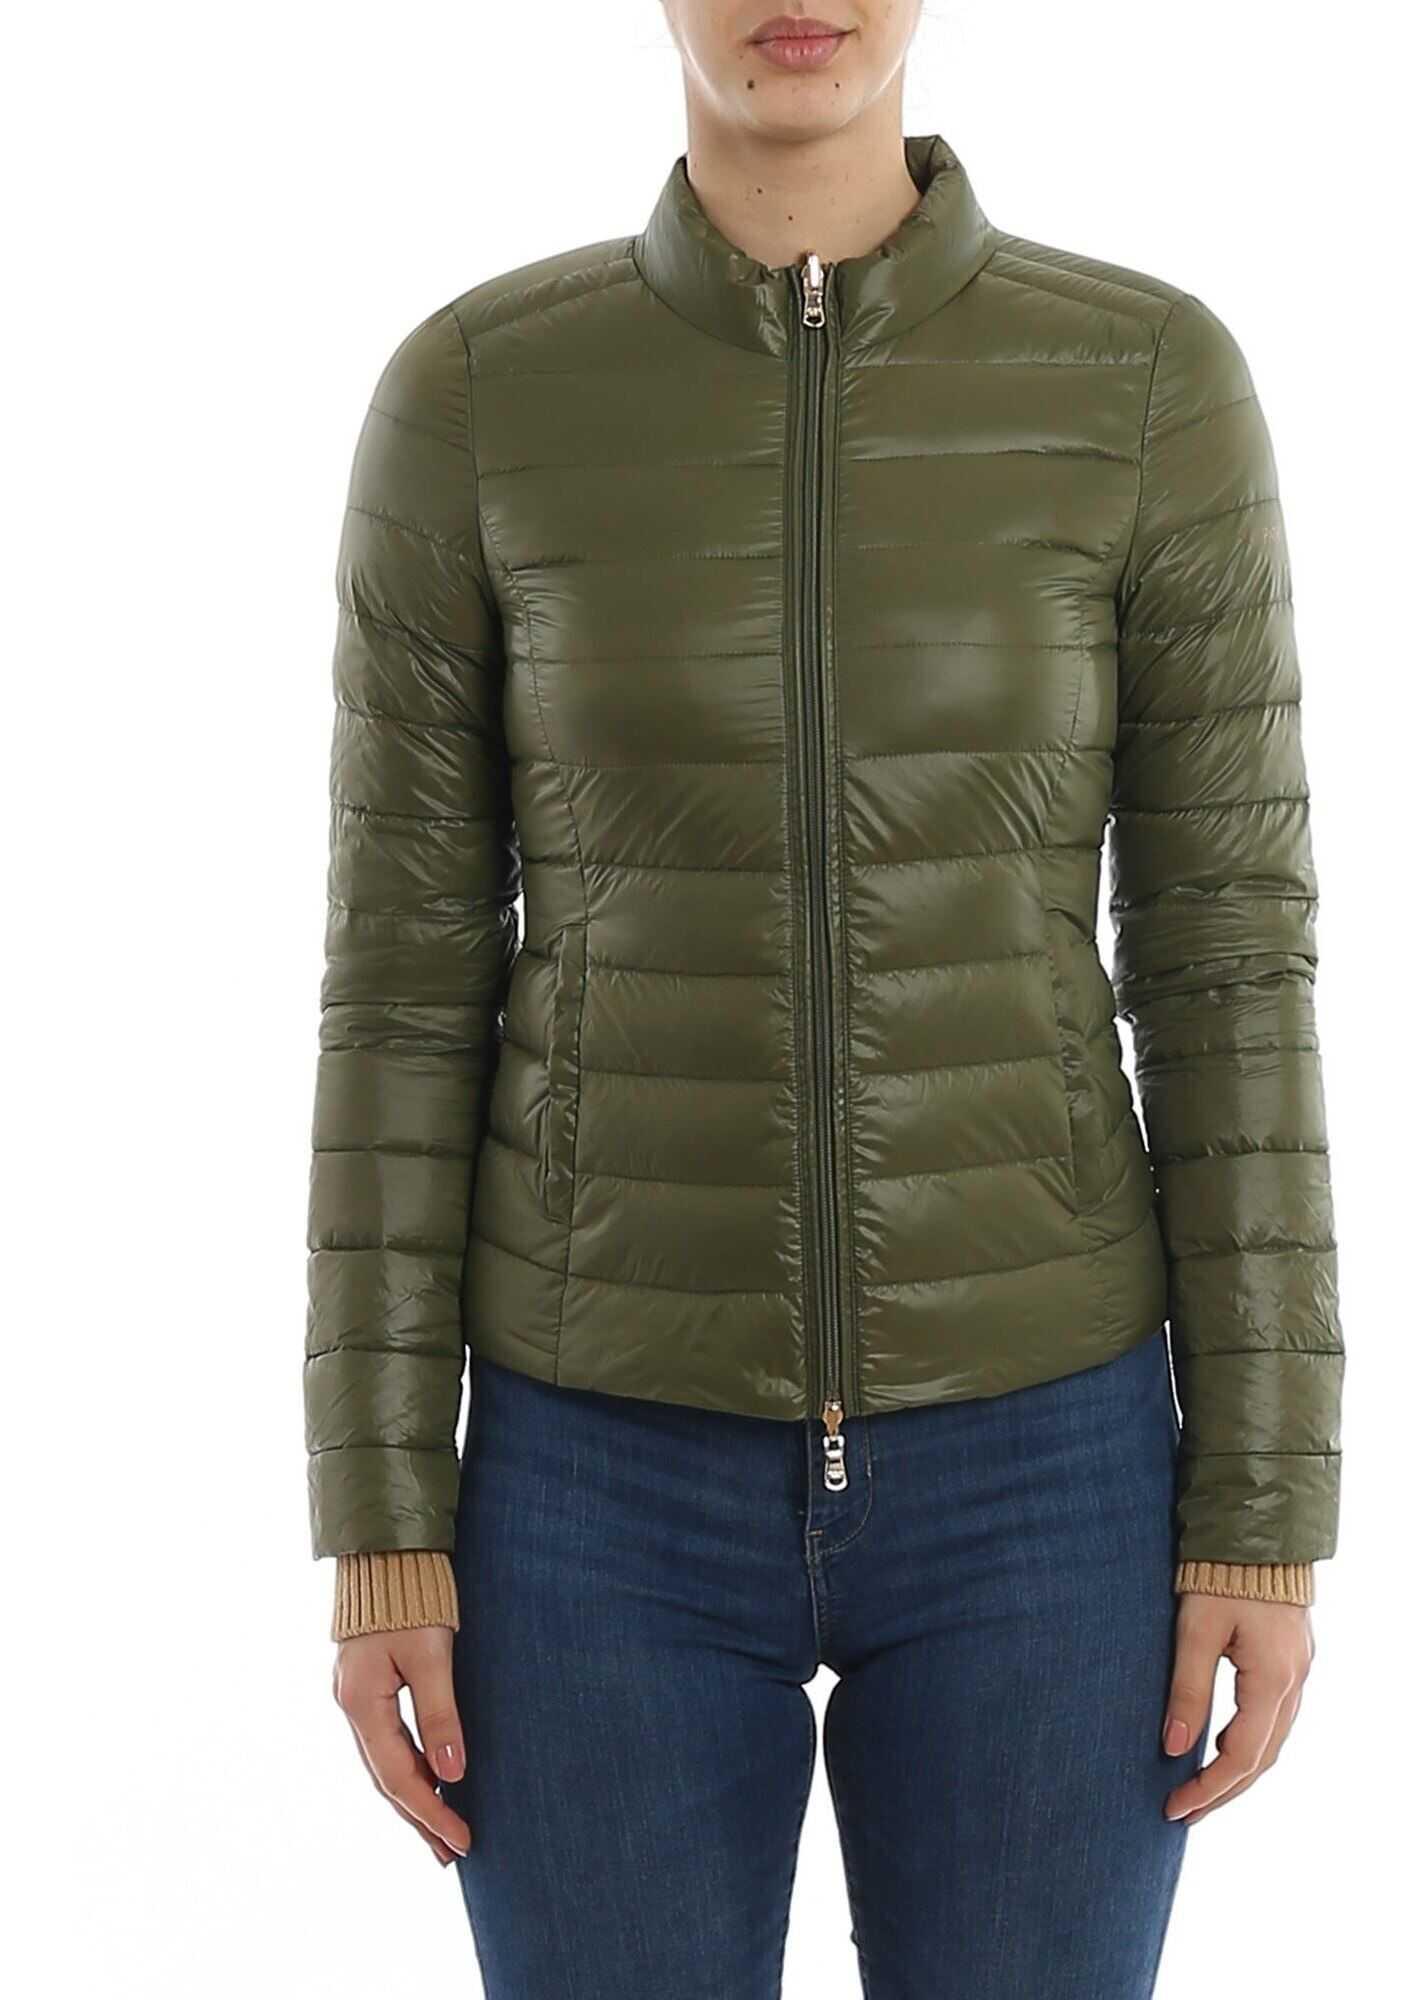 Patrizia Pepe Reversible Puffer Jacket Green Green